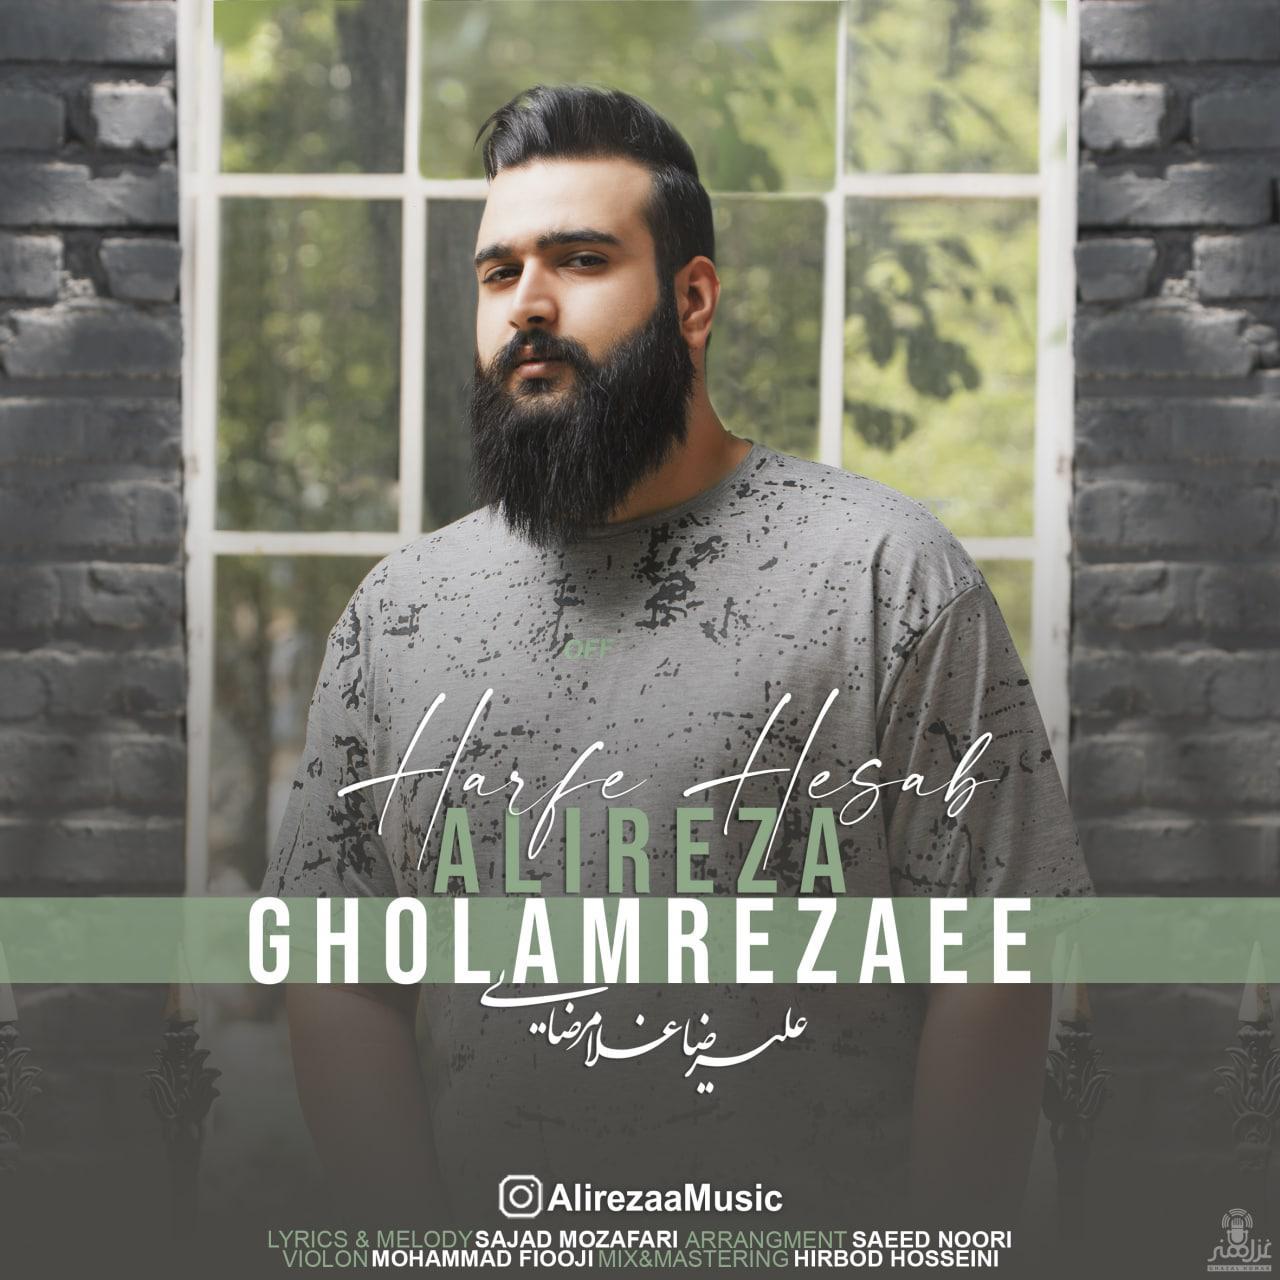 Alireza Gholamrezaee – Harfe Hesab